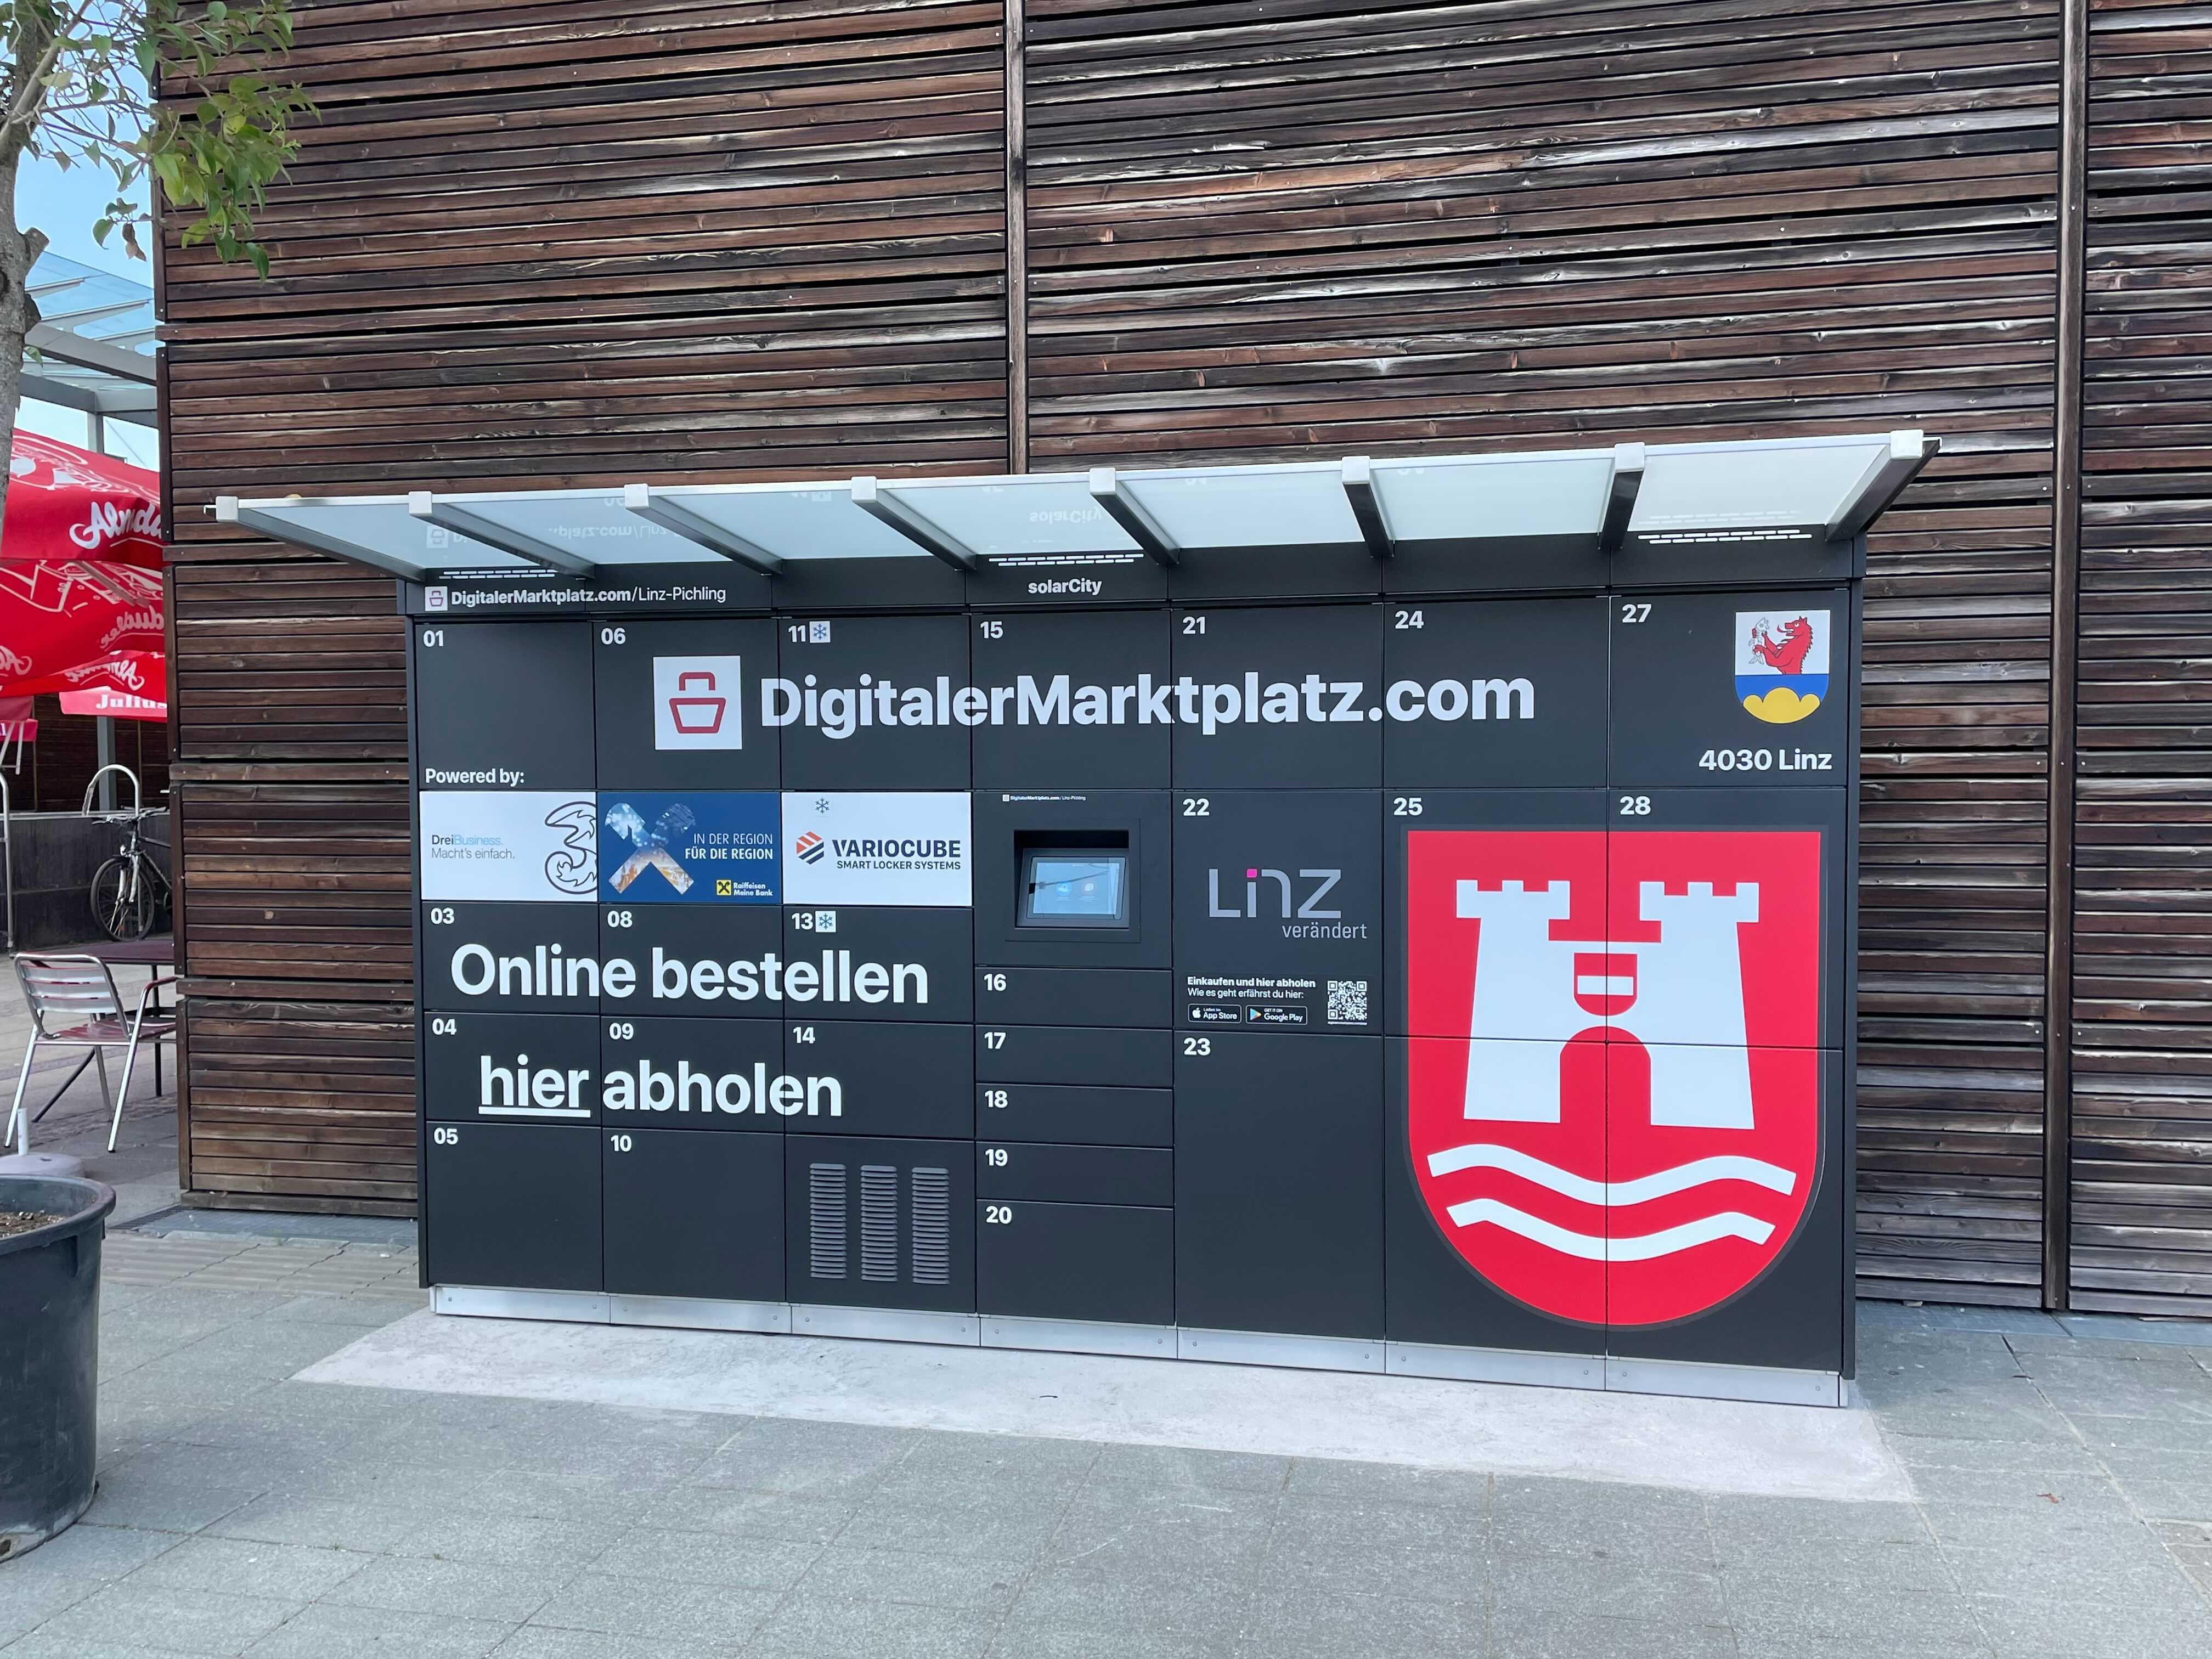 DMP Abholstation - Linz, Solar City